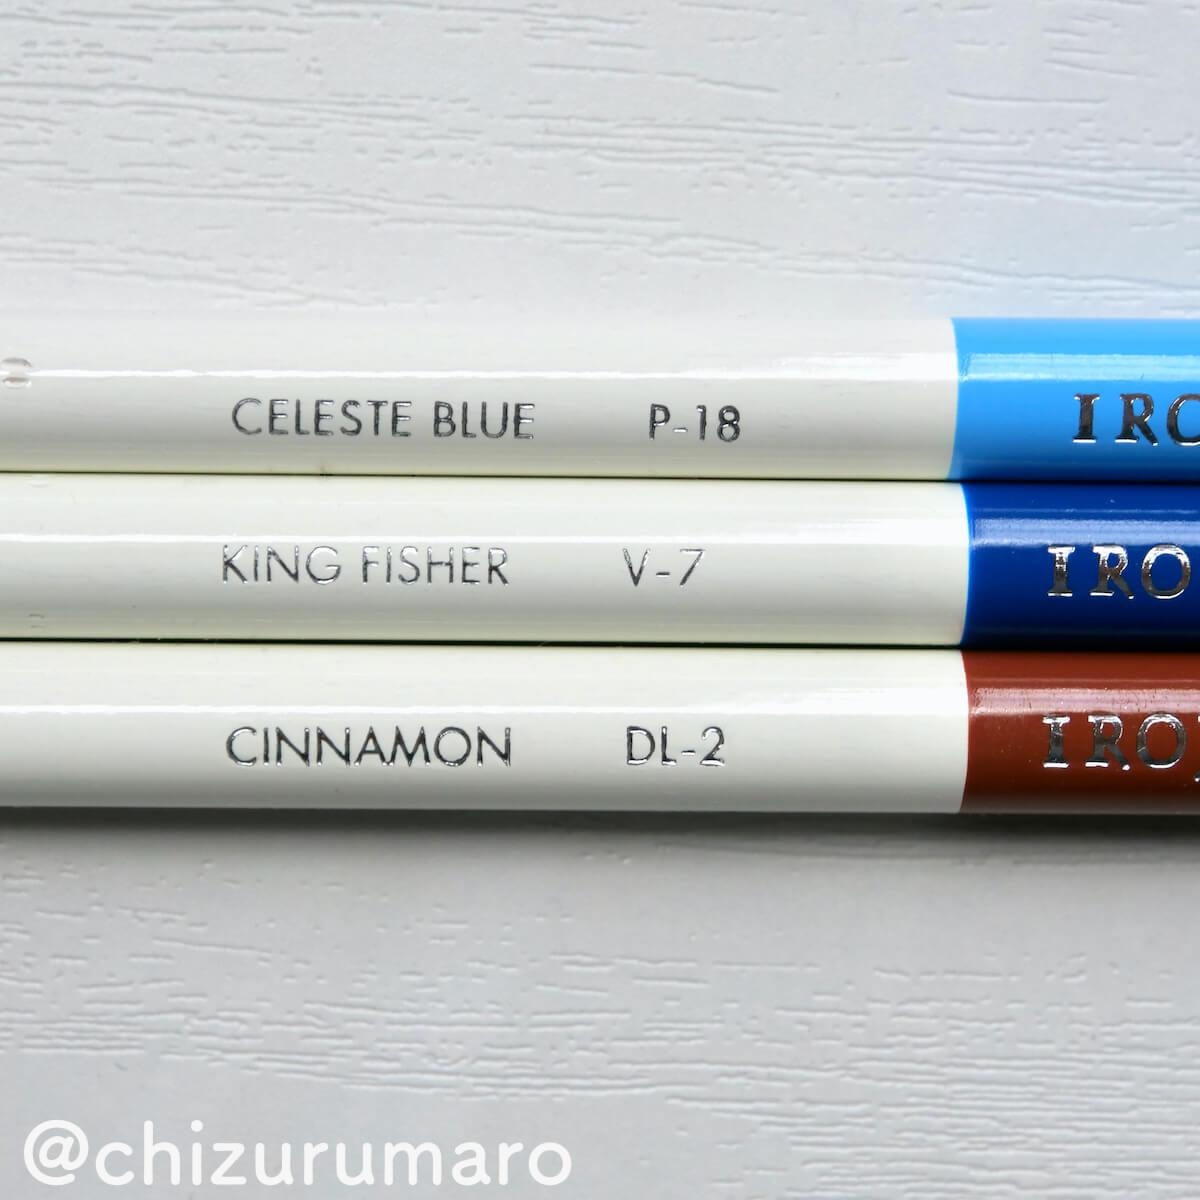 f:id:chizurumaro:20210413164206j:plain